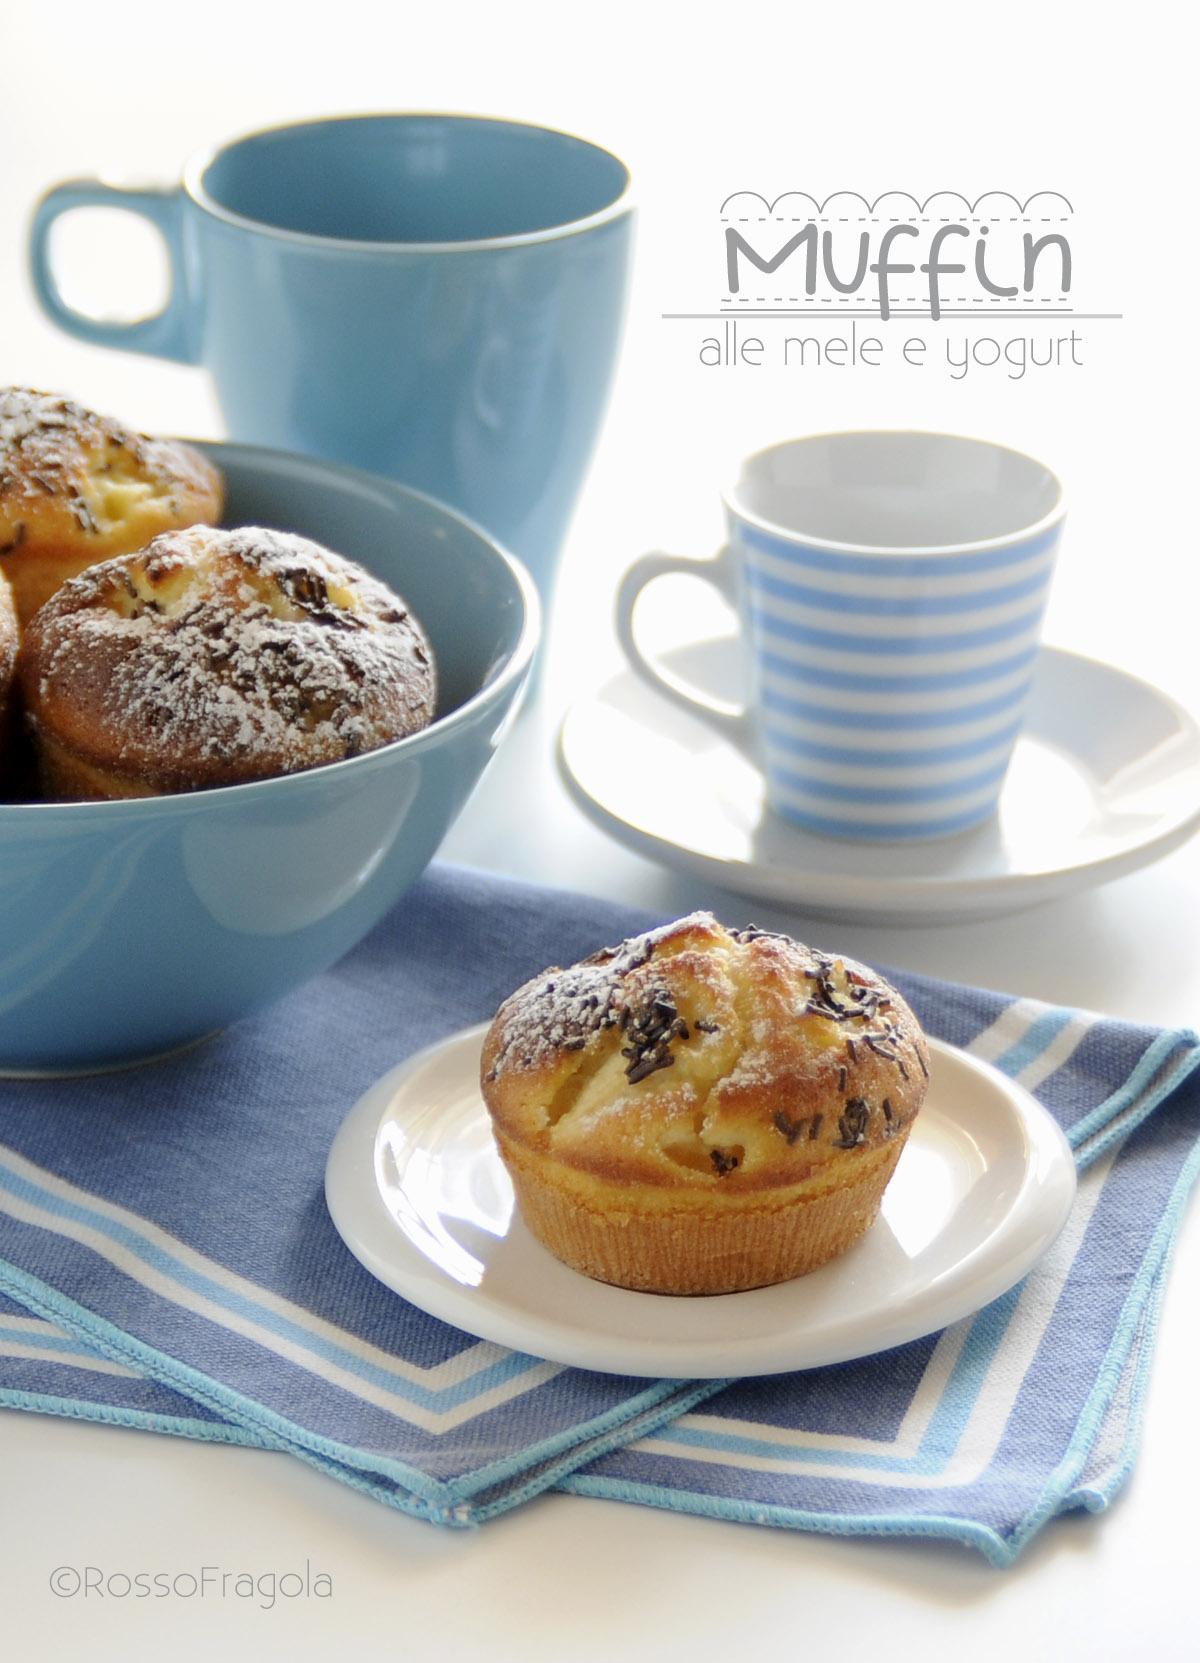 muffin alle mele e yogurt-